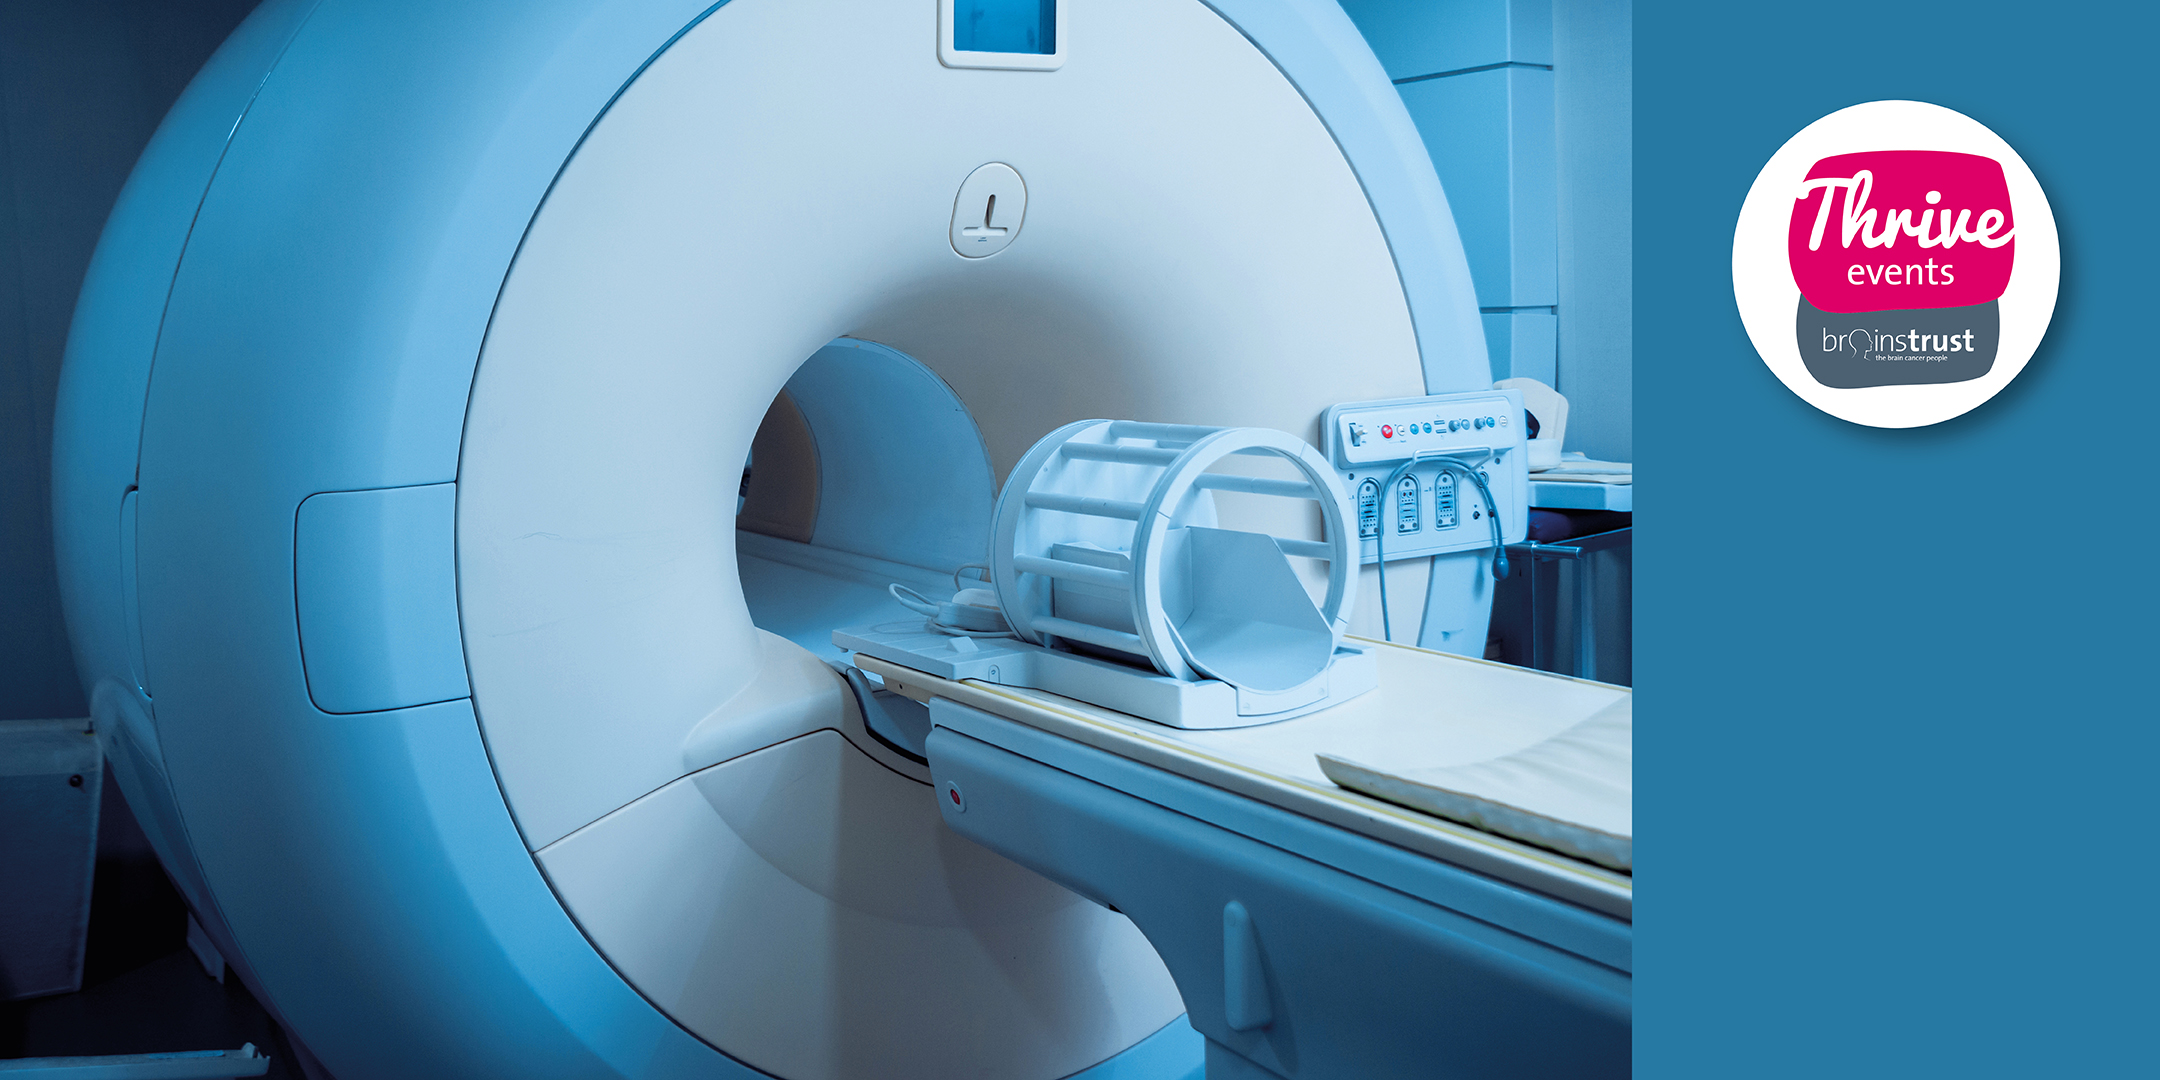 eventbrite radiotherapy